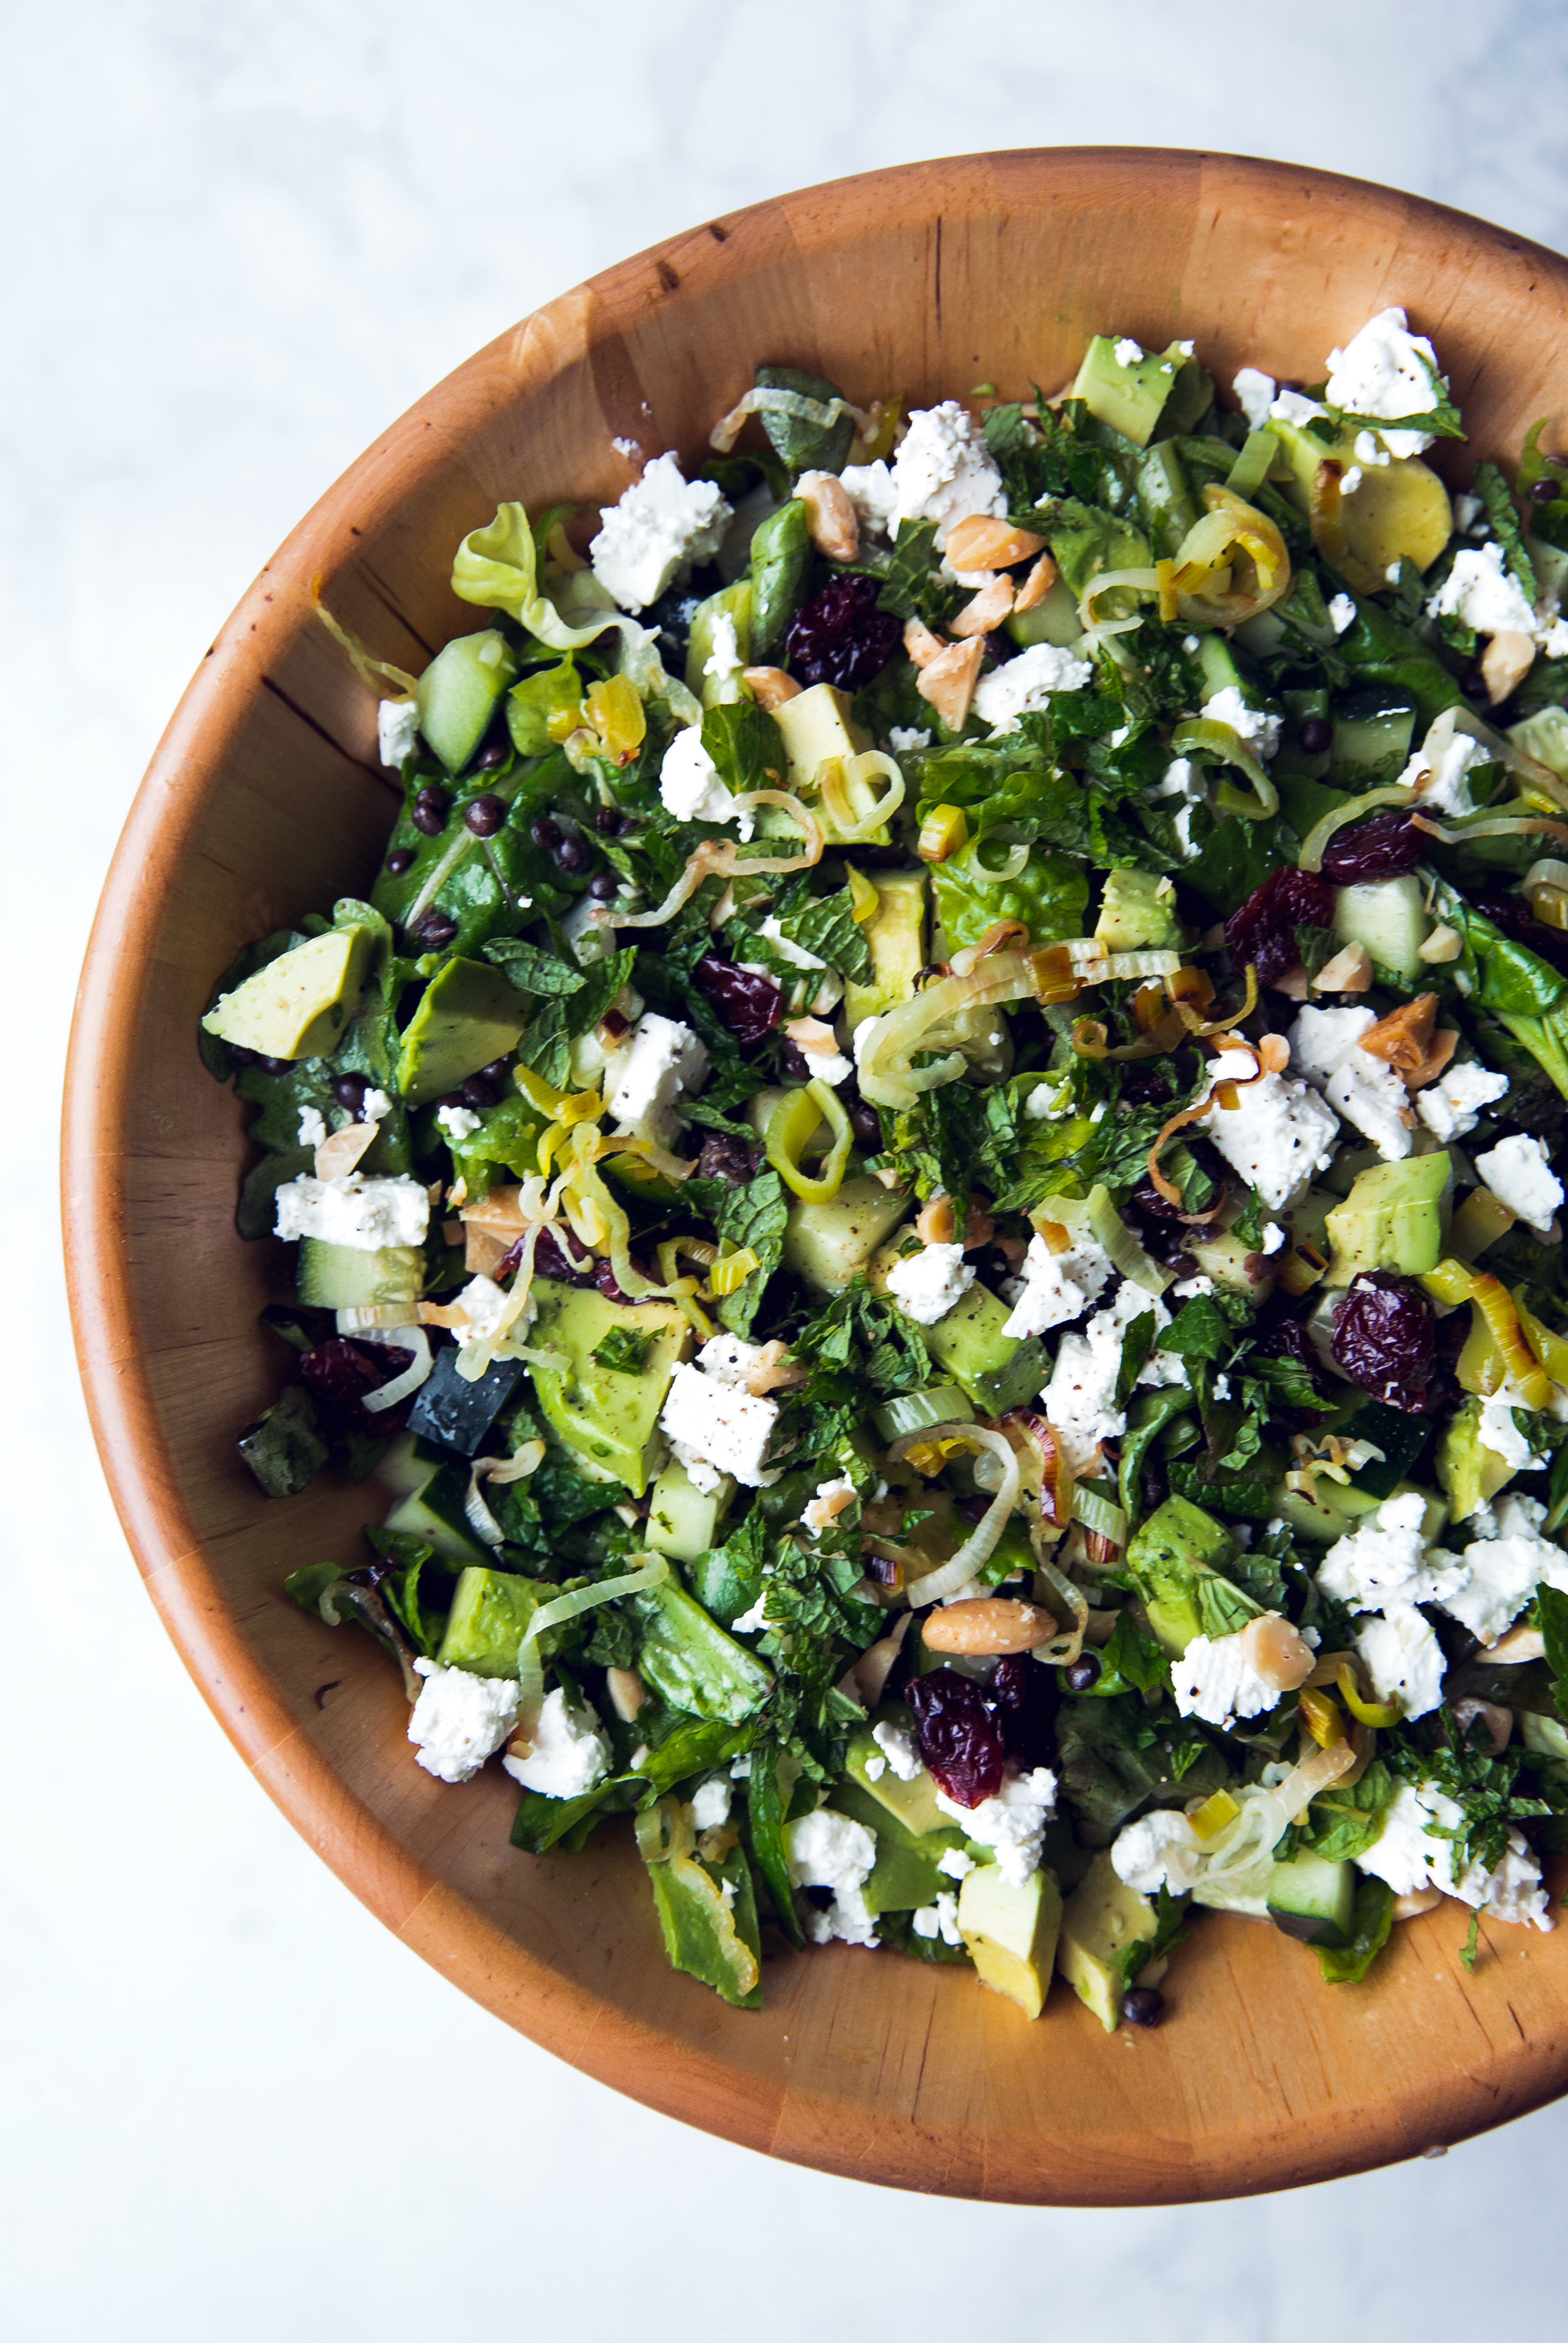 Black Lentil, Feta, and Avocado Salad With Lemon-Dijon Vinaigrette